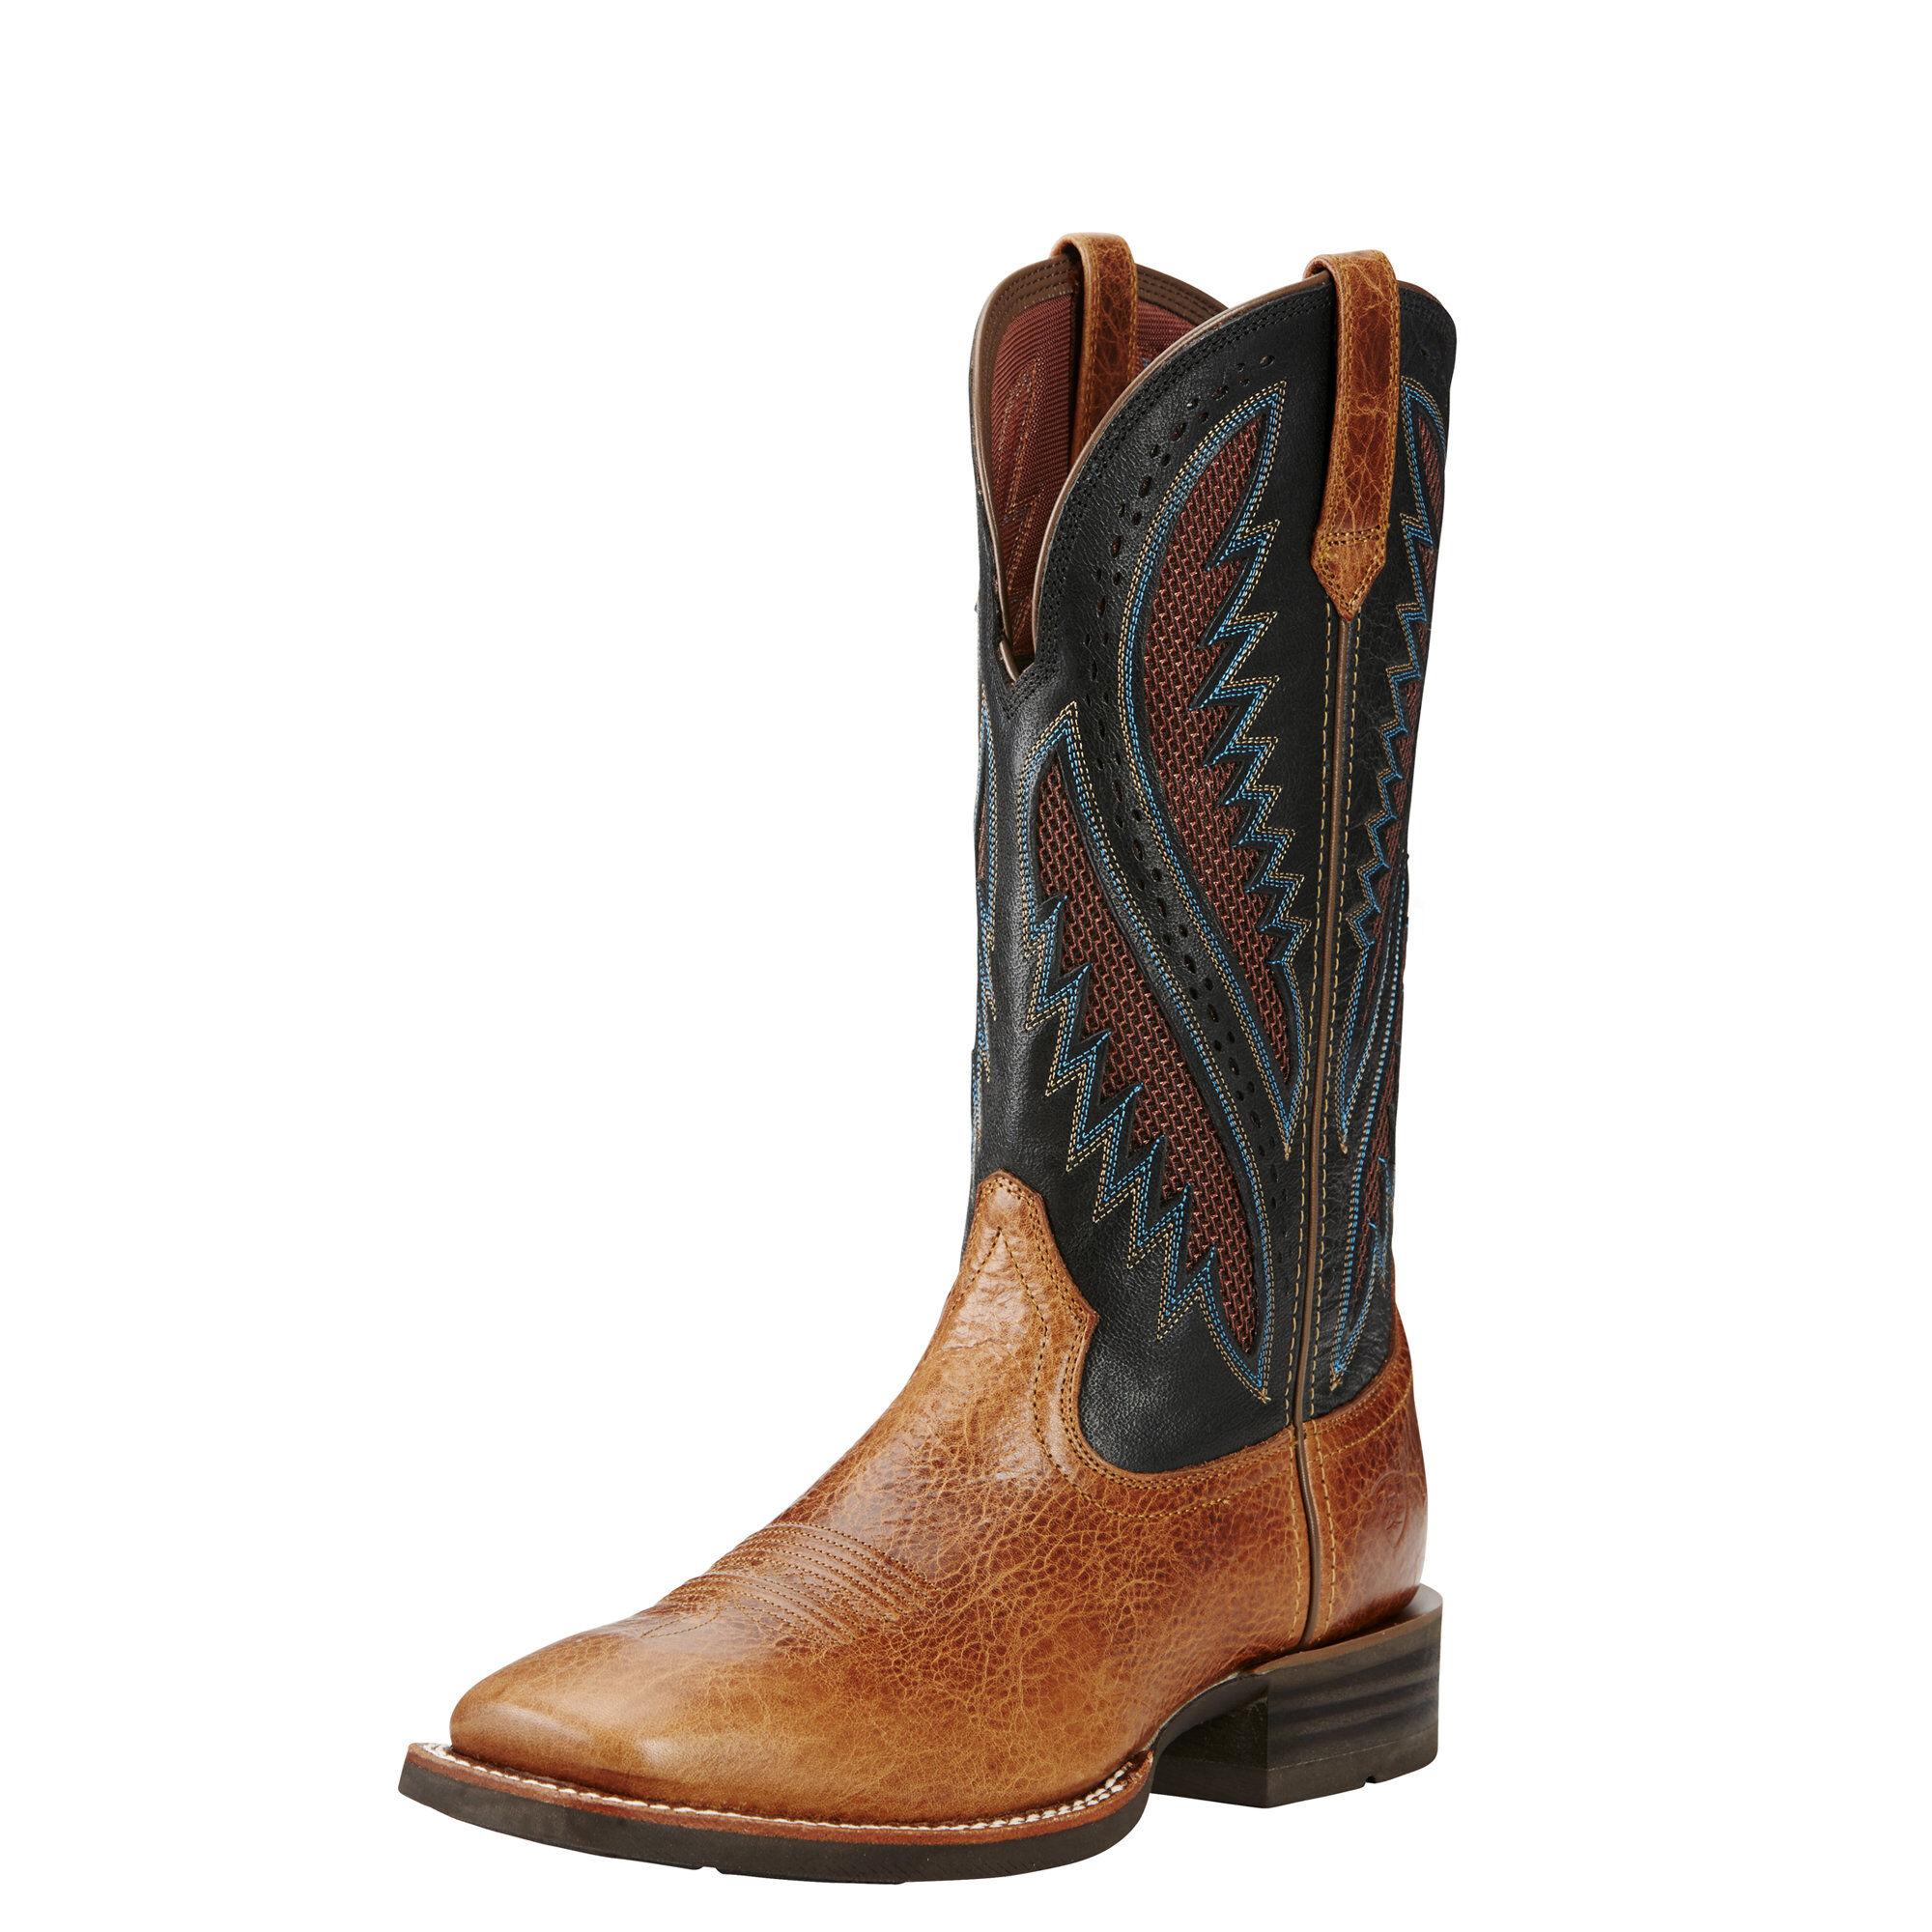 Quickdraw VentTEK Western Boot   Ariat